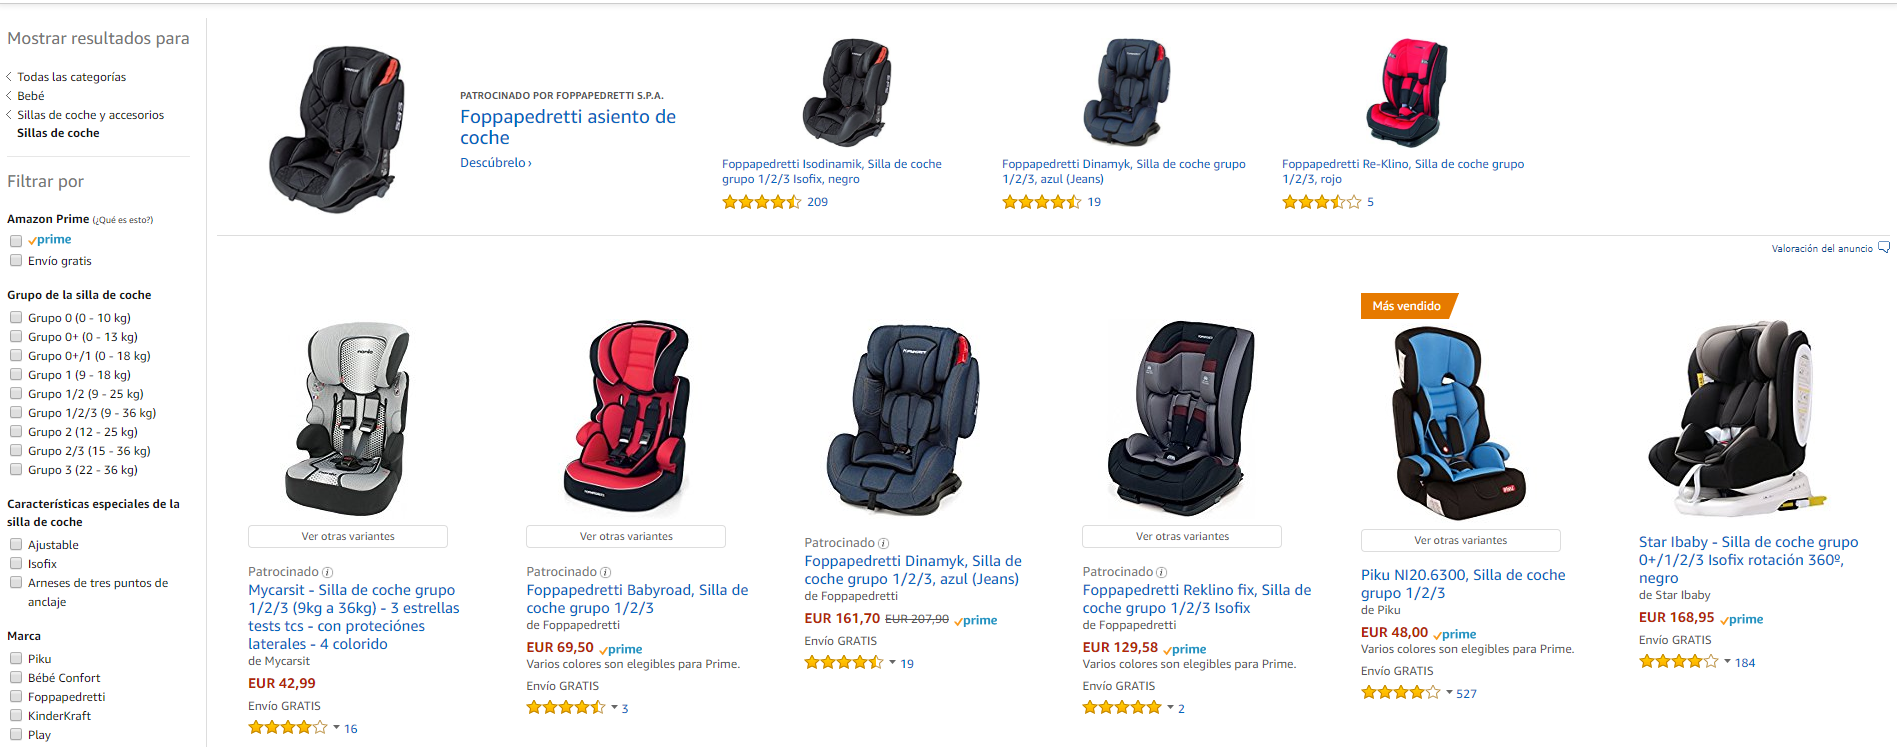 Produits Sponsorisés Amazon